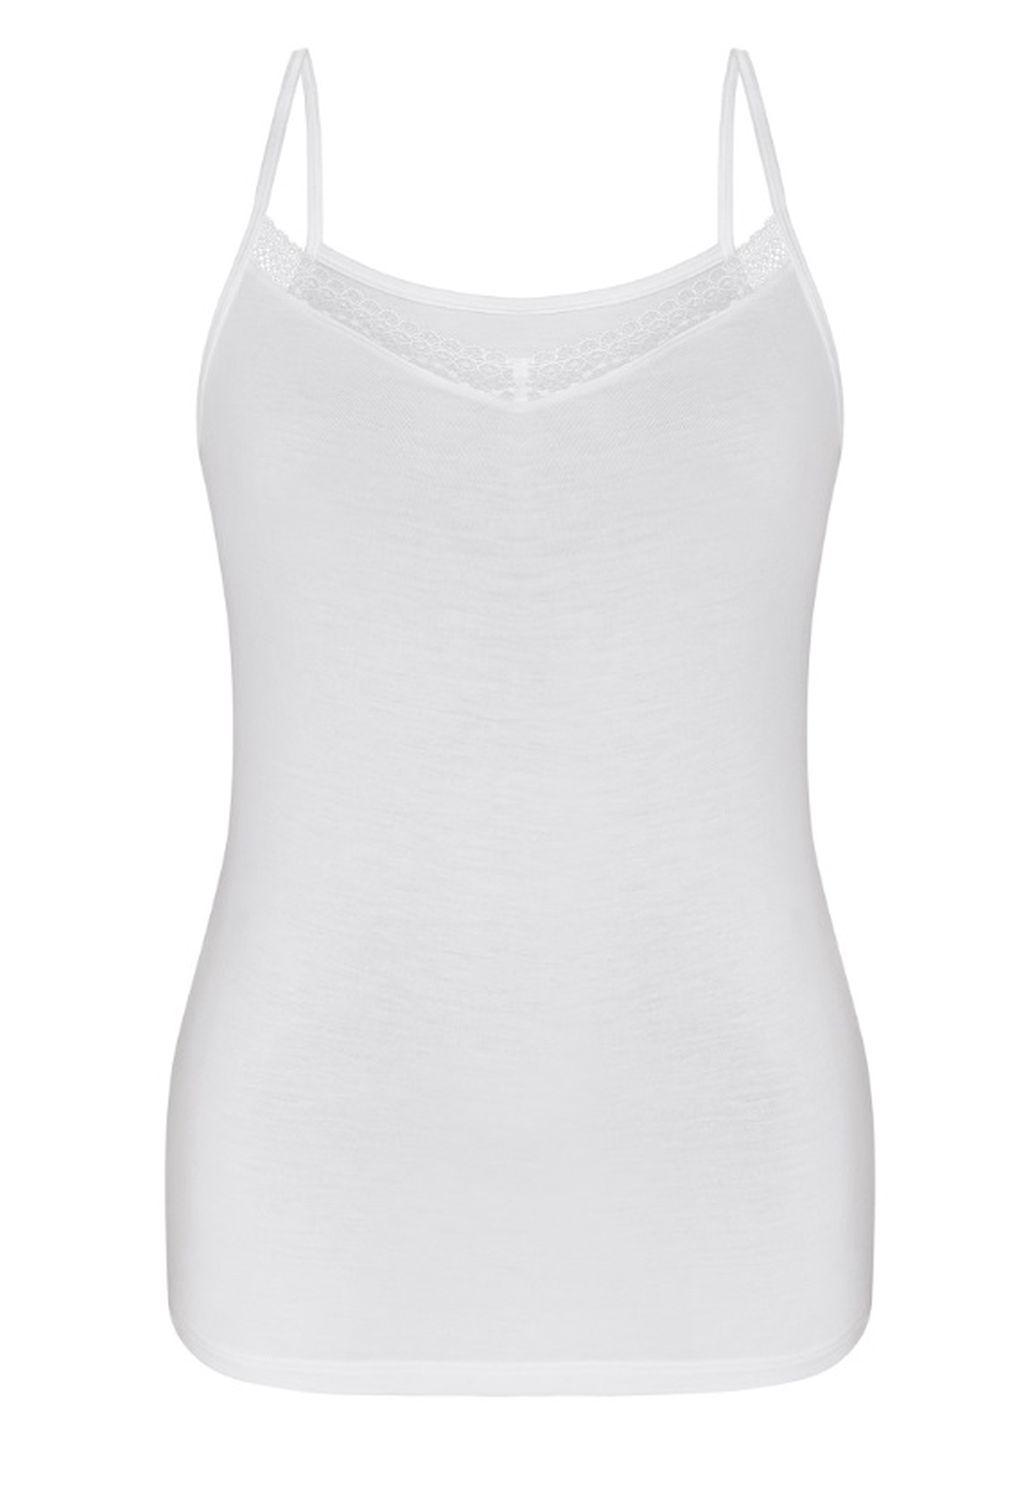 Sassa Damen Top Lovesome Lace Hemd Hemdchen Shirt white navy 36 - 46